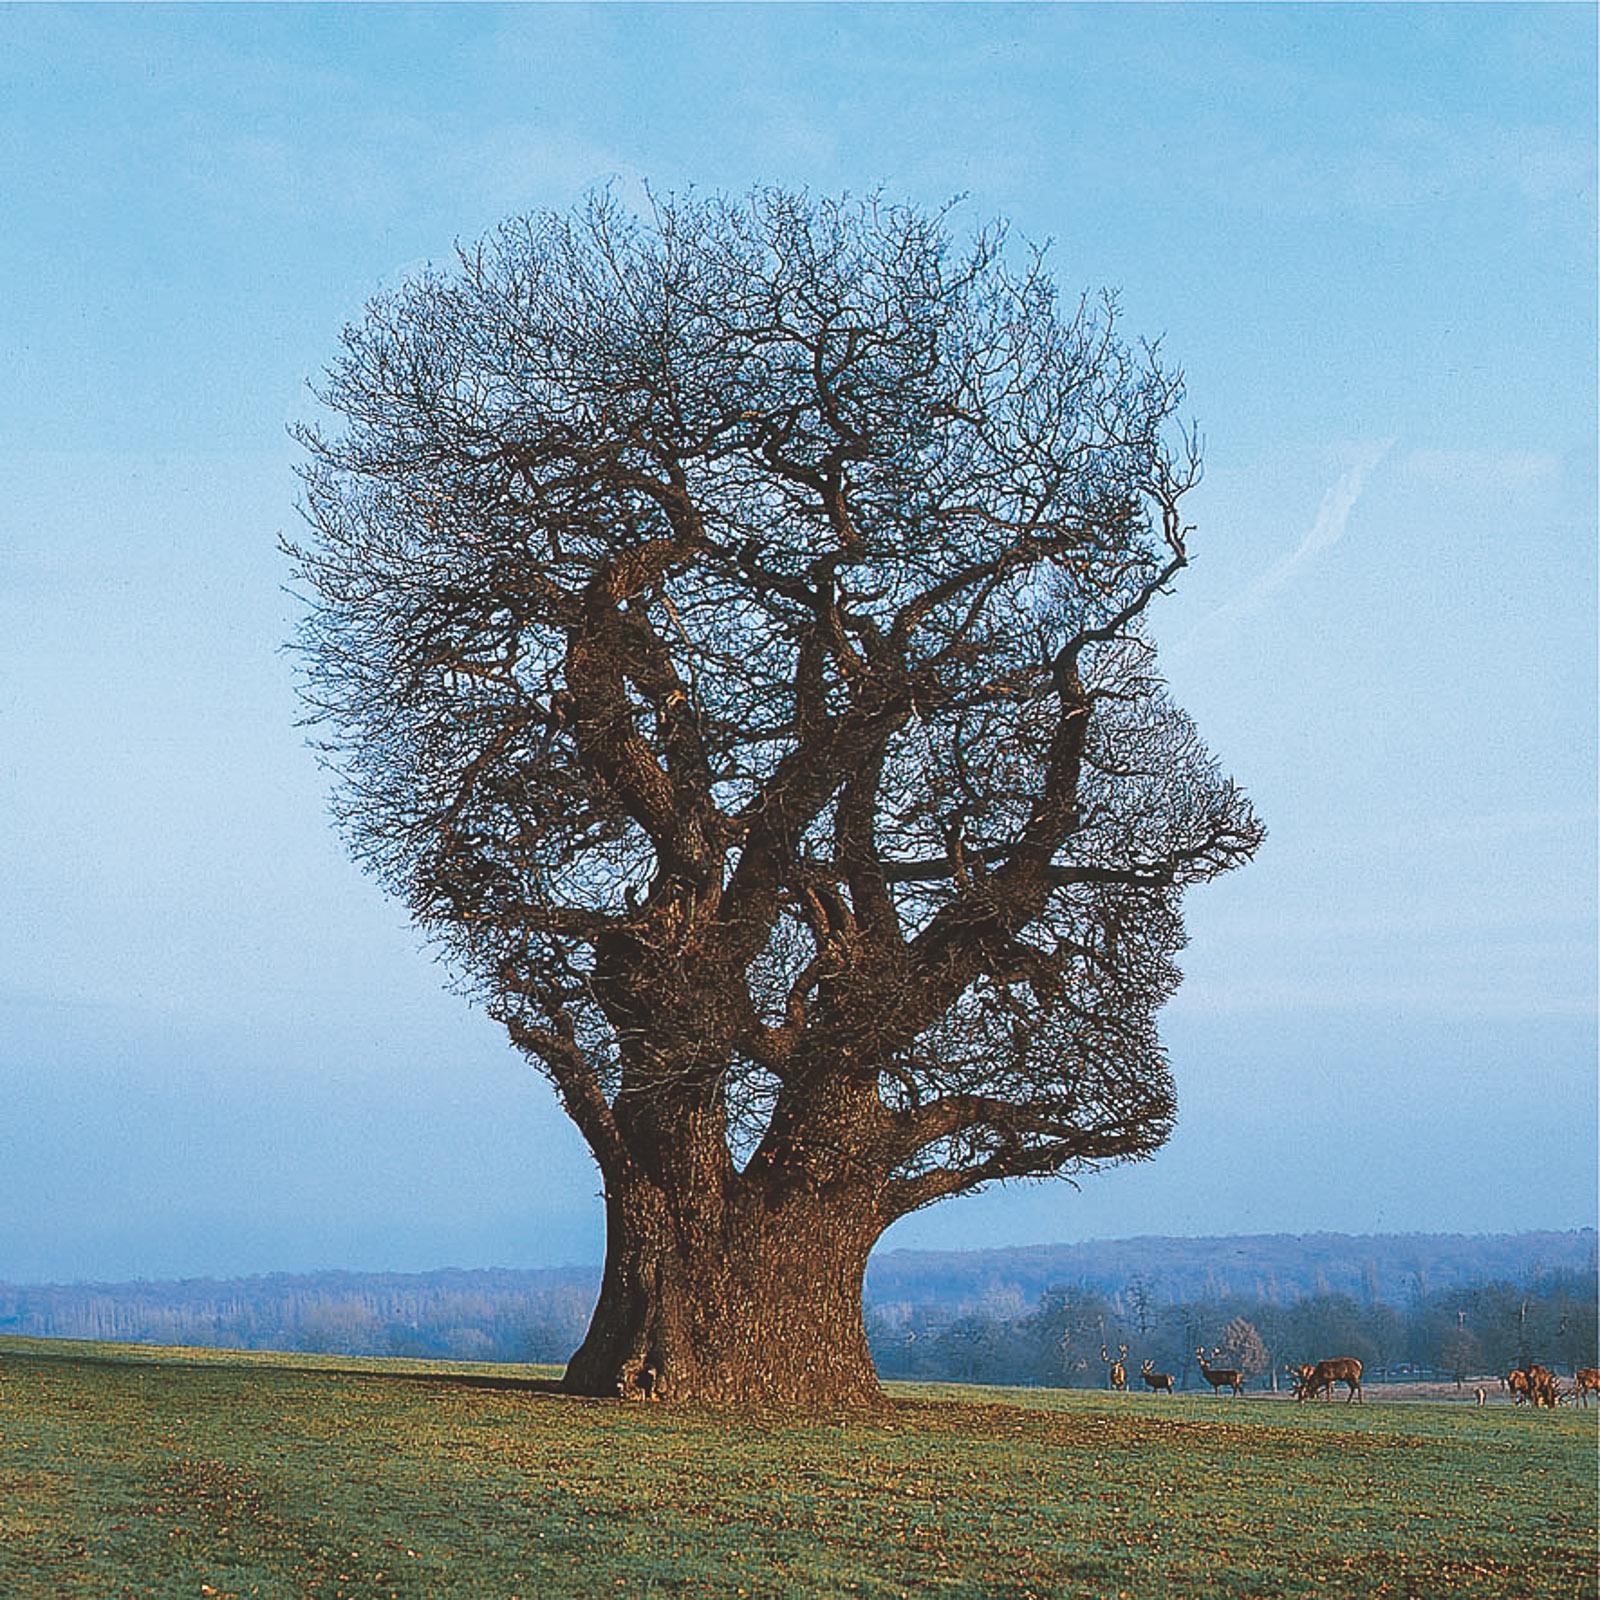 mindfulness noosphere meditate telepathy